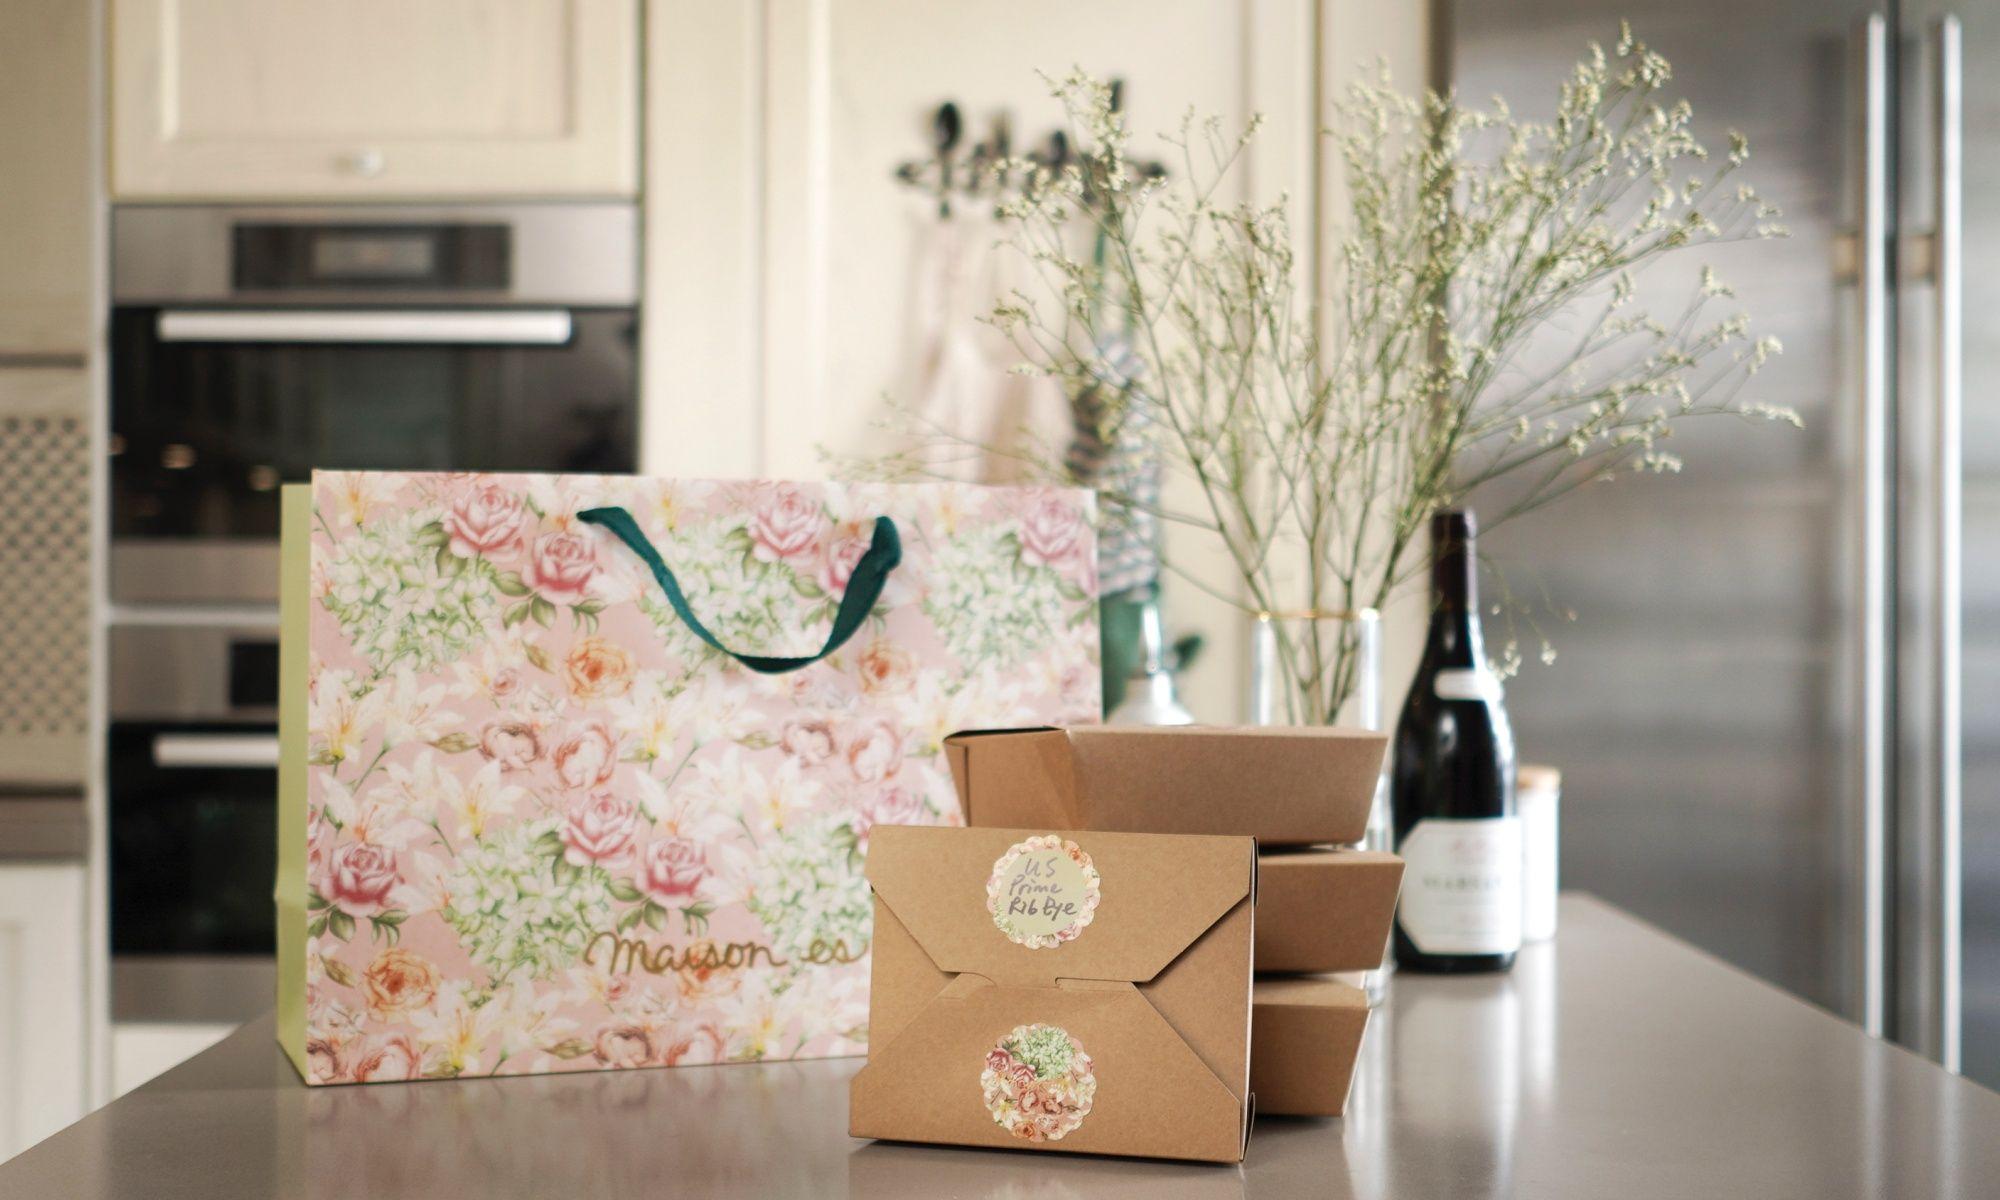 Maison Es Launches New Three-Course Home Cook Set Menu